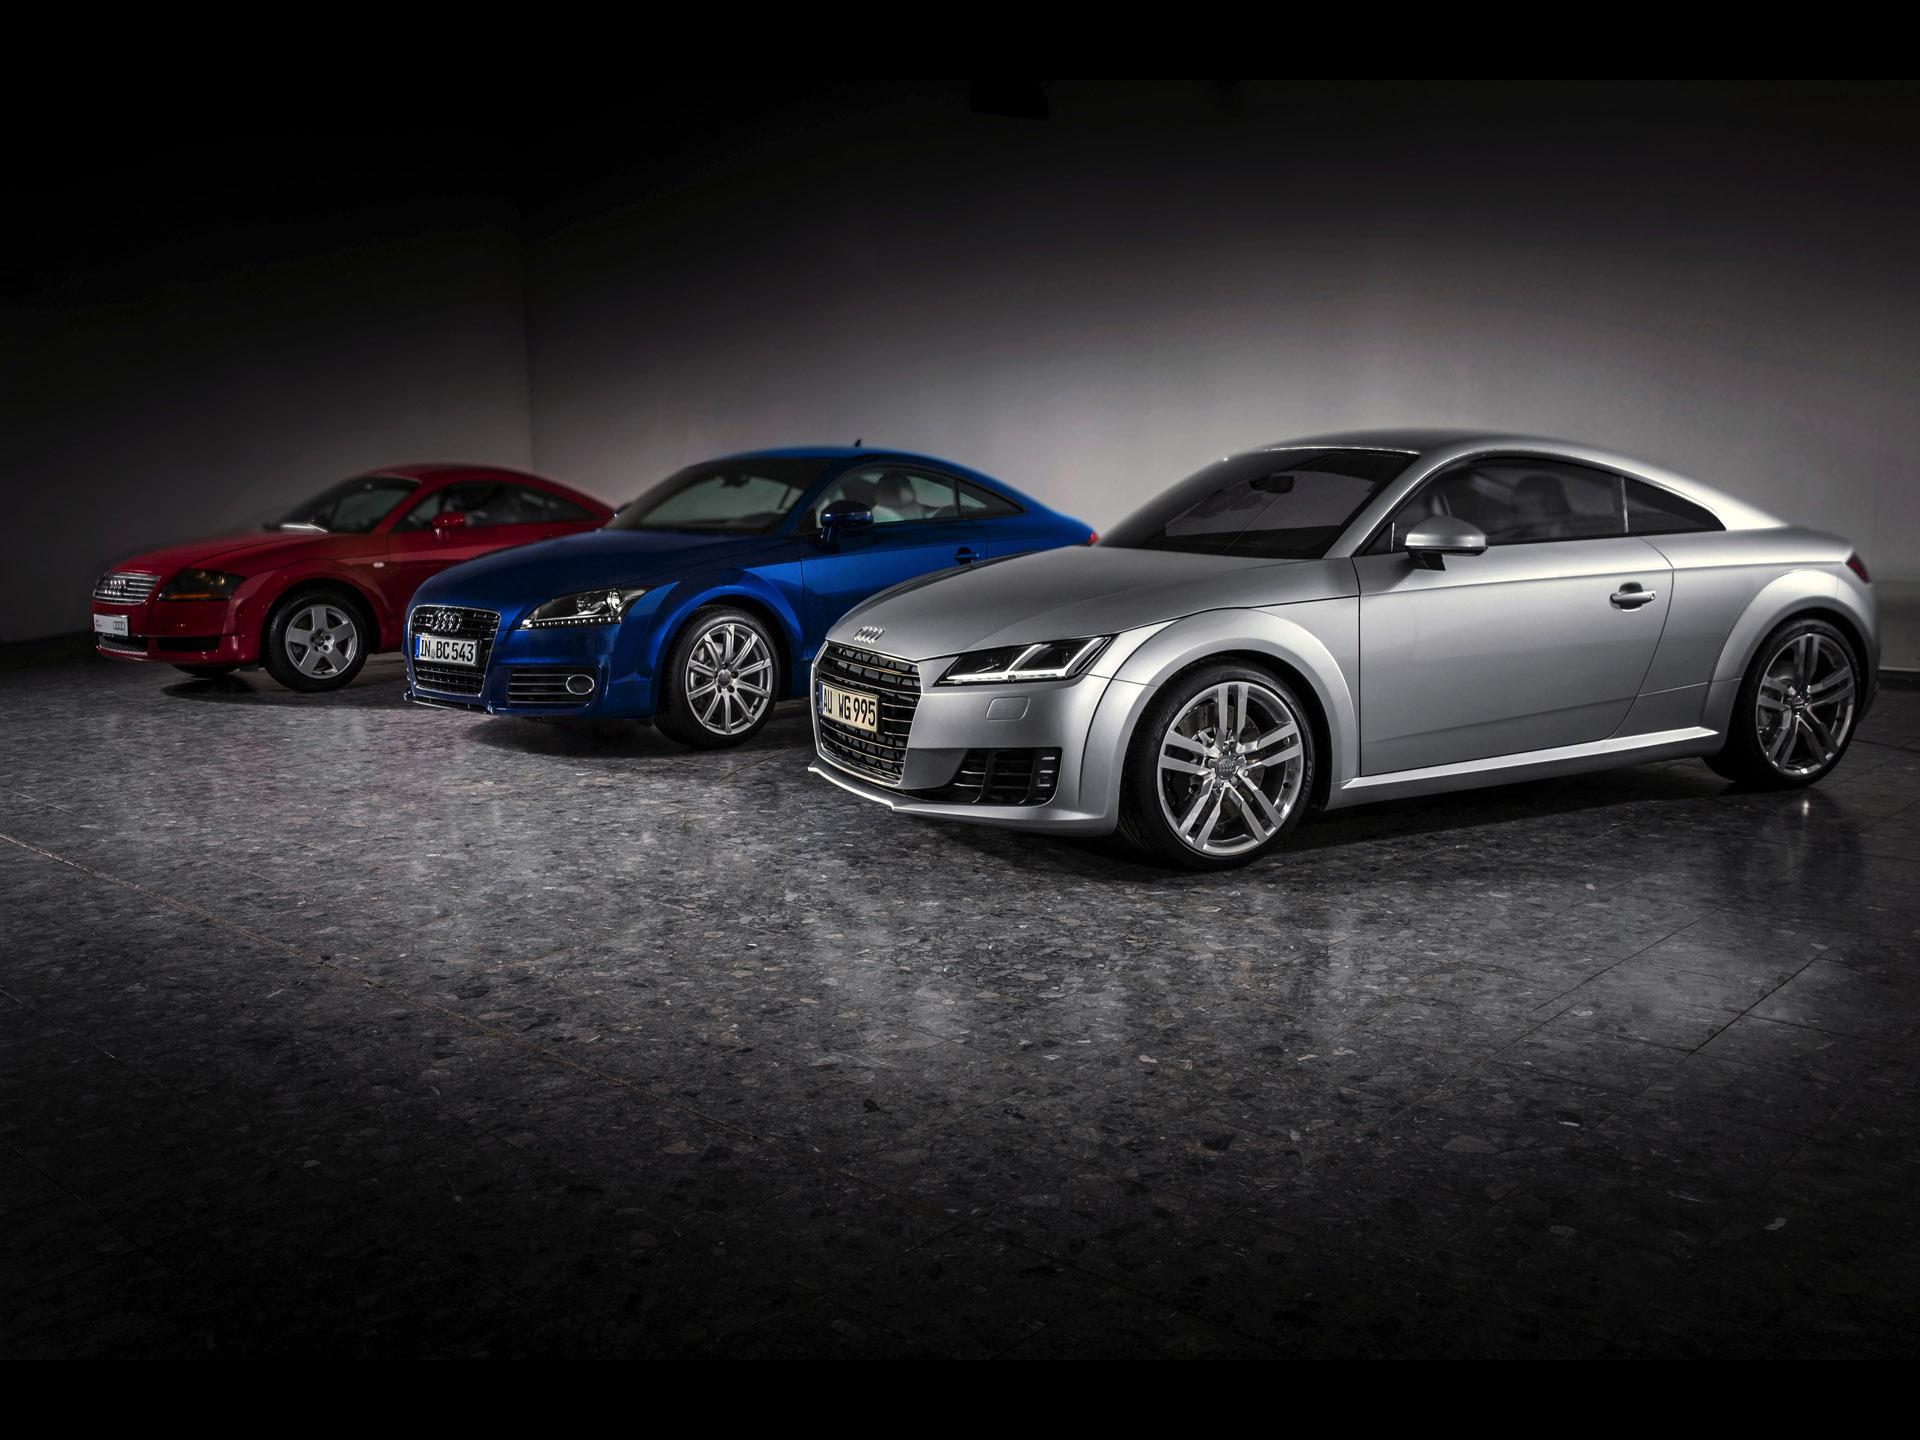 Audi Tt 2014 アウディに嵌まる 壁紙画像ブログ